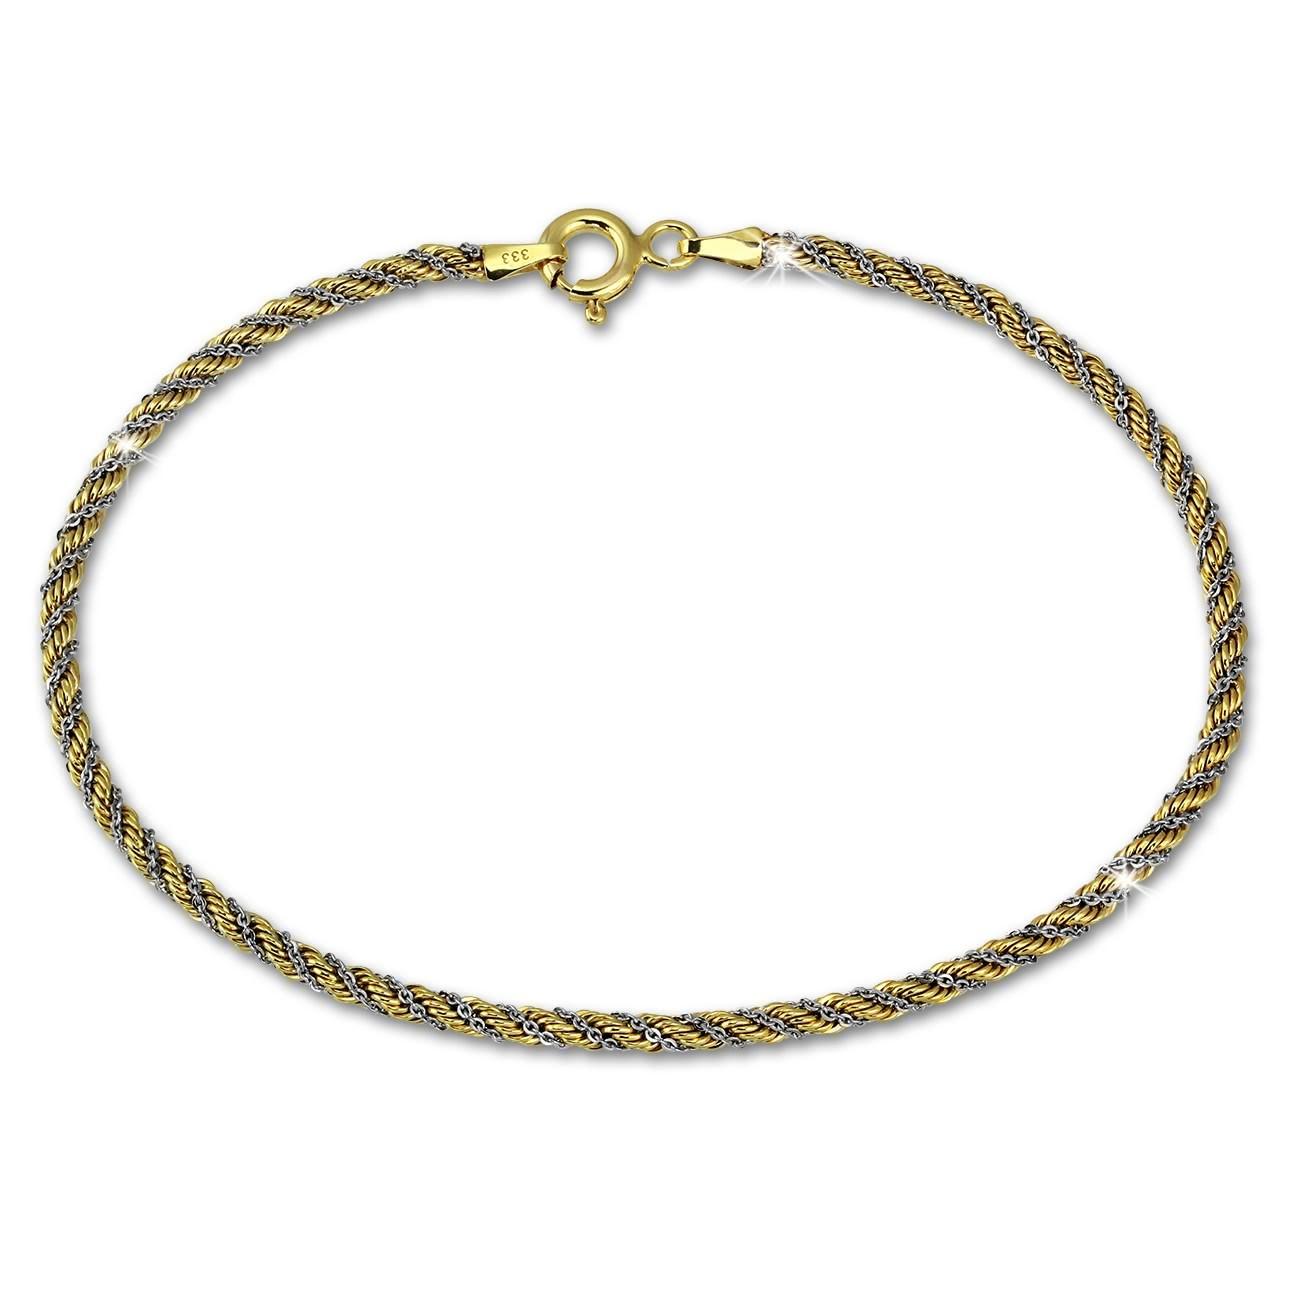 SilberDream Armband Kordel hohl bicolor 333 Gold 18,5cm 8 Karat GDA0388T